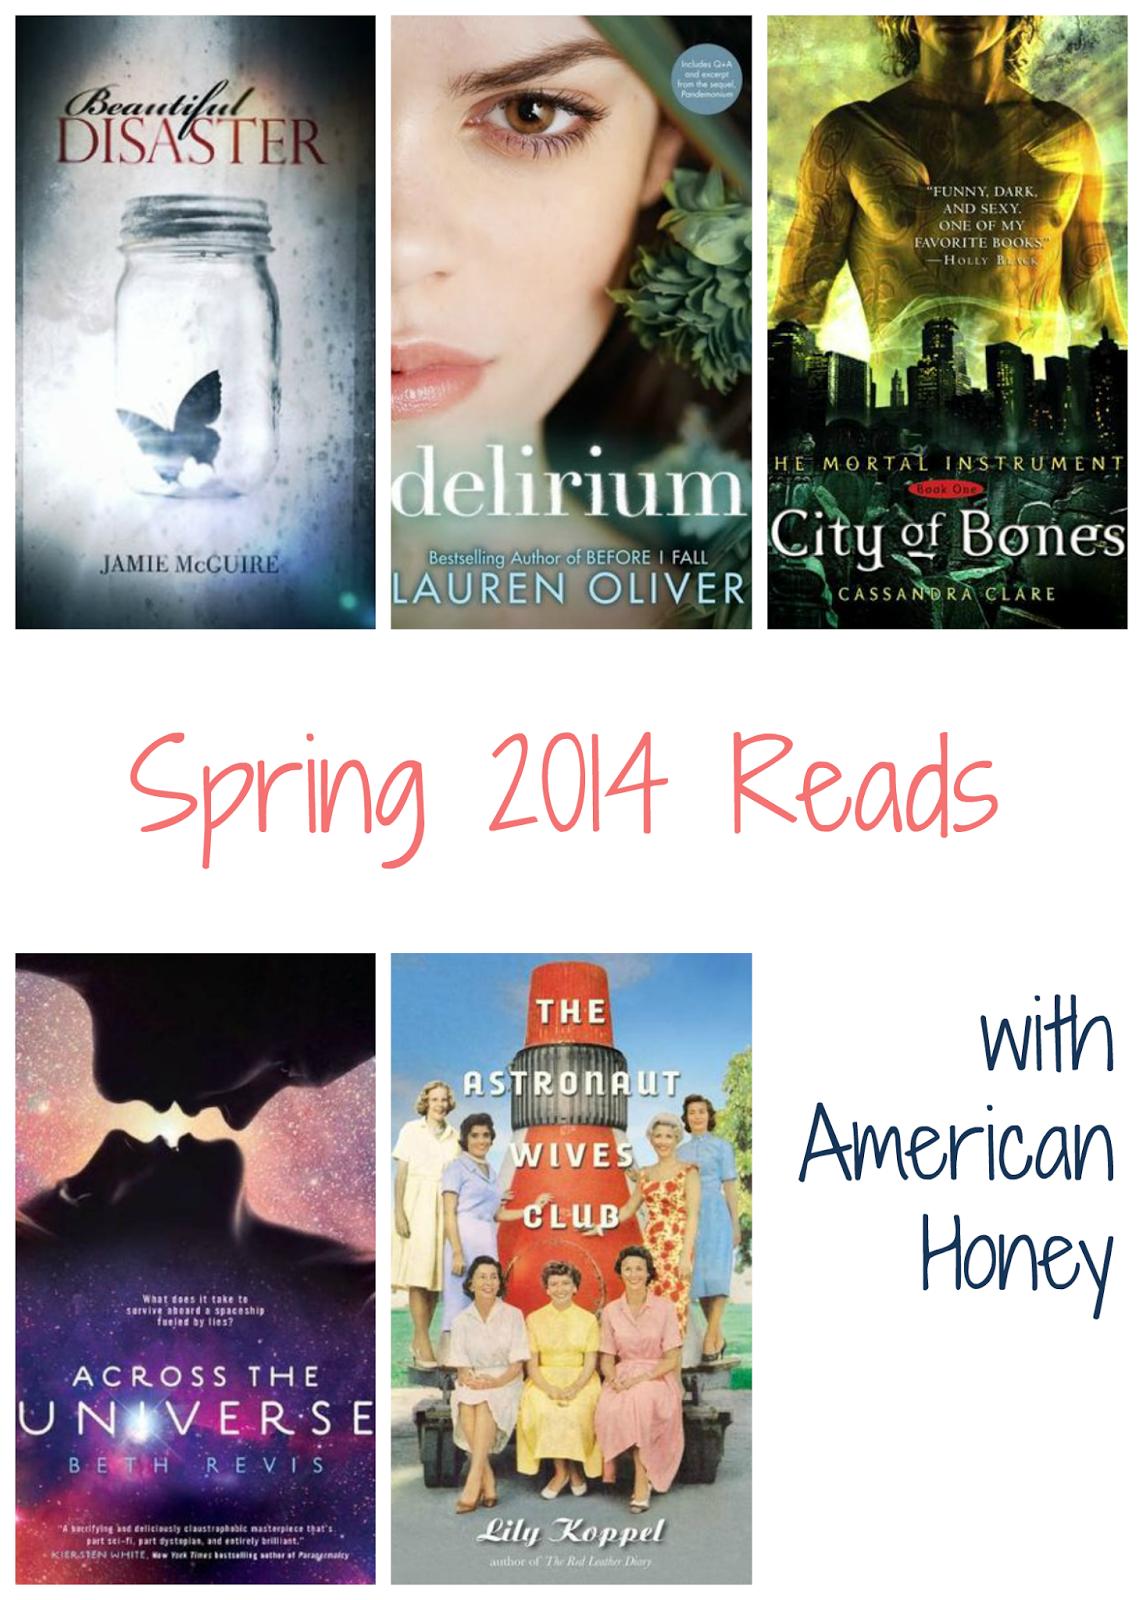 Spring 2014 Reading List